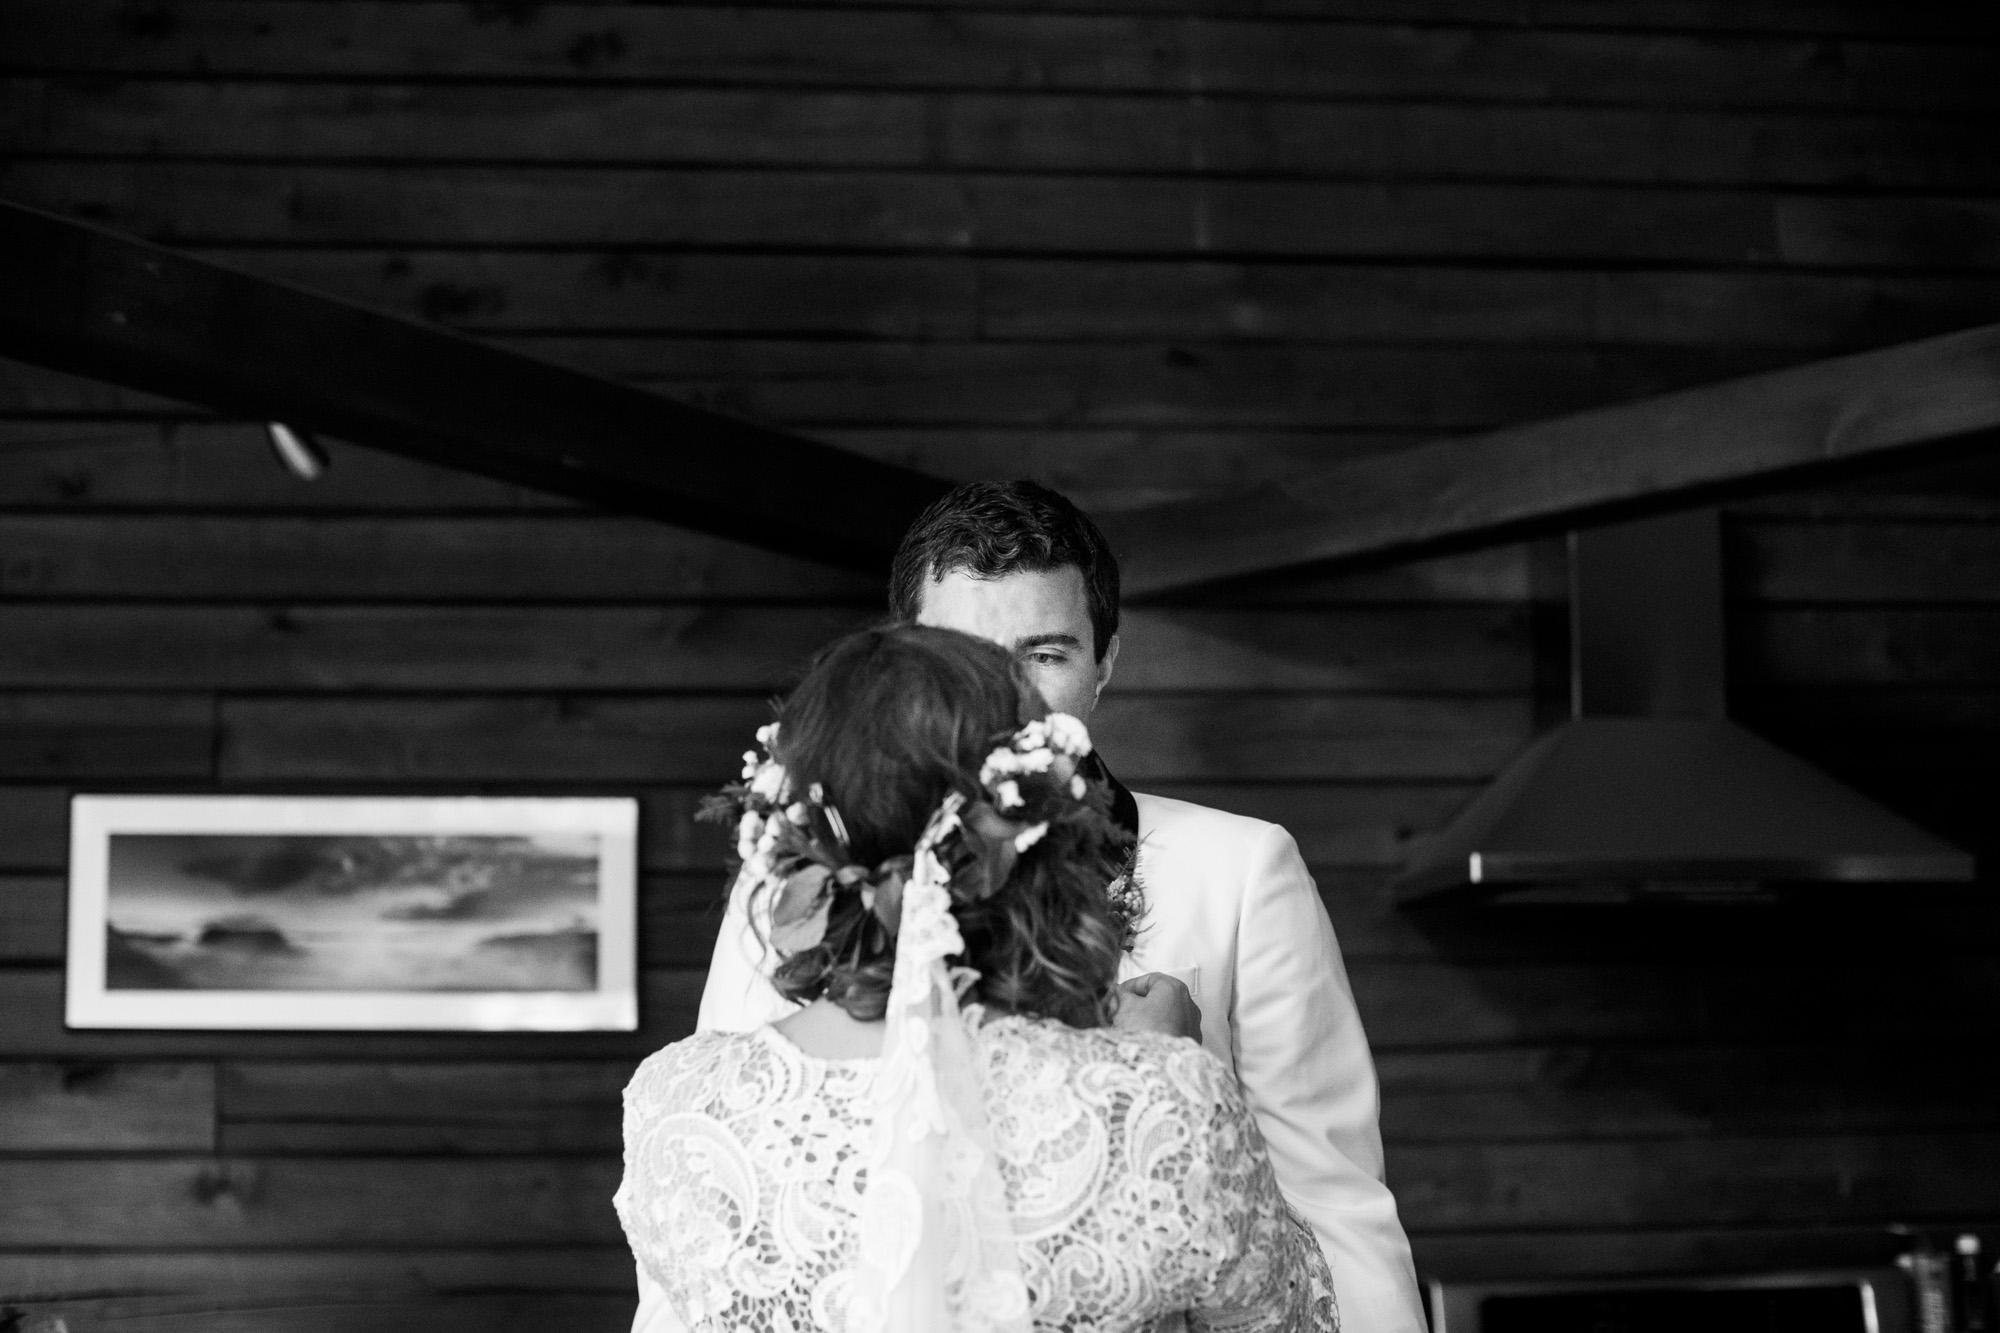 Seriously_Sabrina_Photography_Red_River_Gorge_Kentucky_Wedding_ShawnDana64.jpg